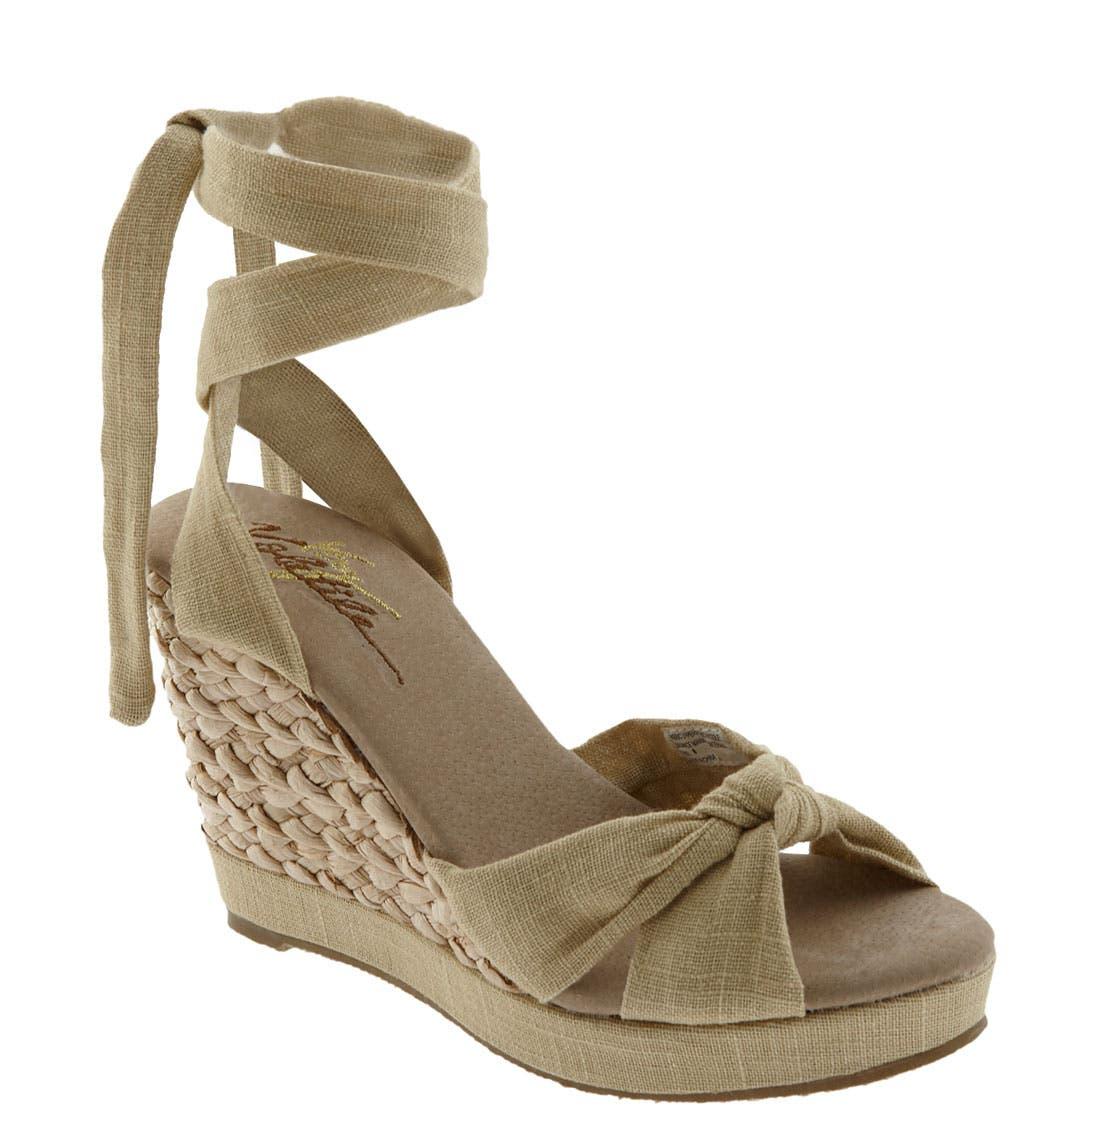 Alternate Image 1 Selected - Volatile 'Carmen' Sandal